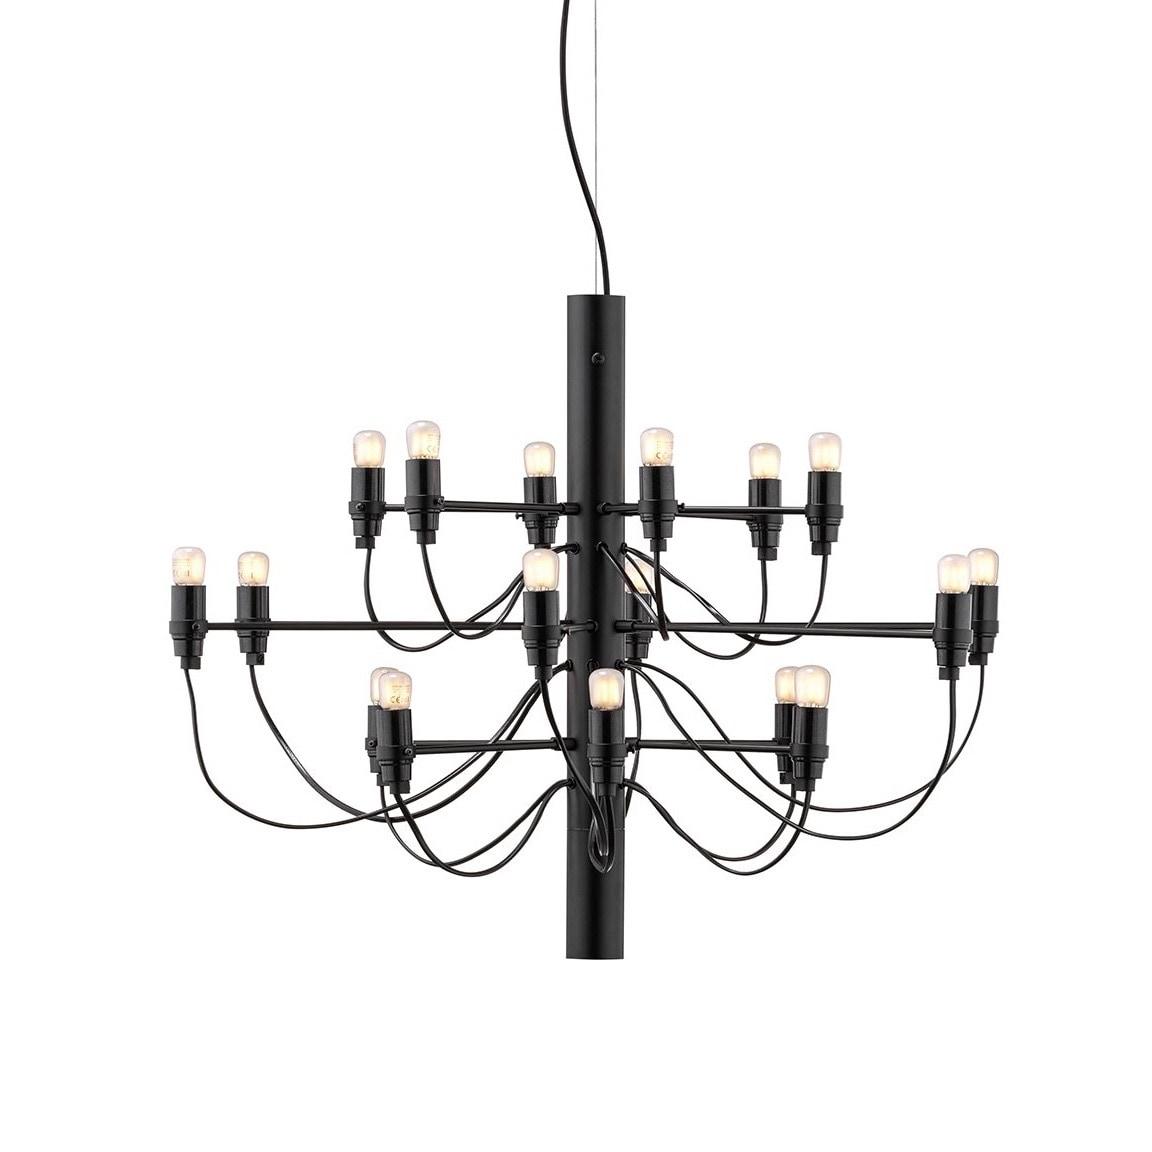 2097/18 Sarfatti LED Taklampa svart